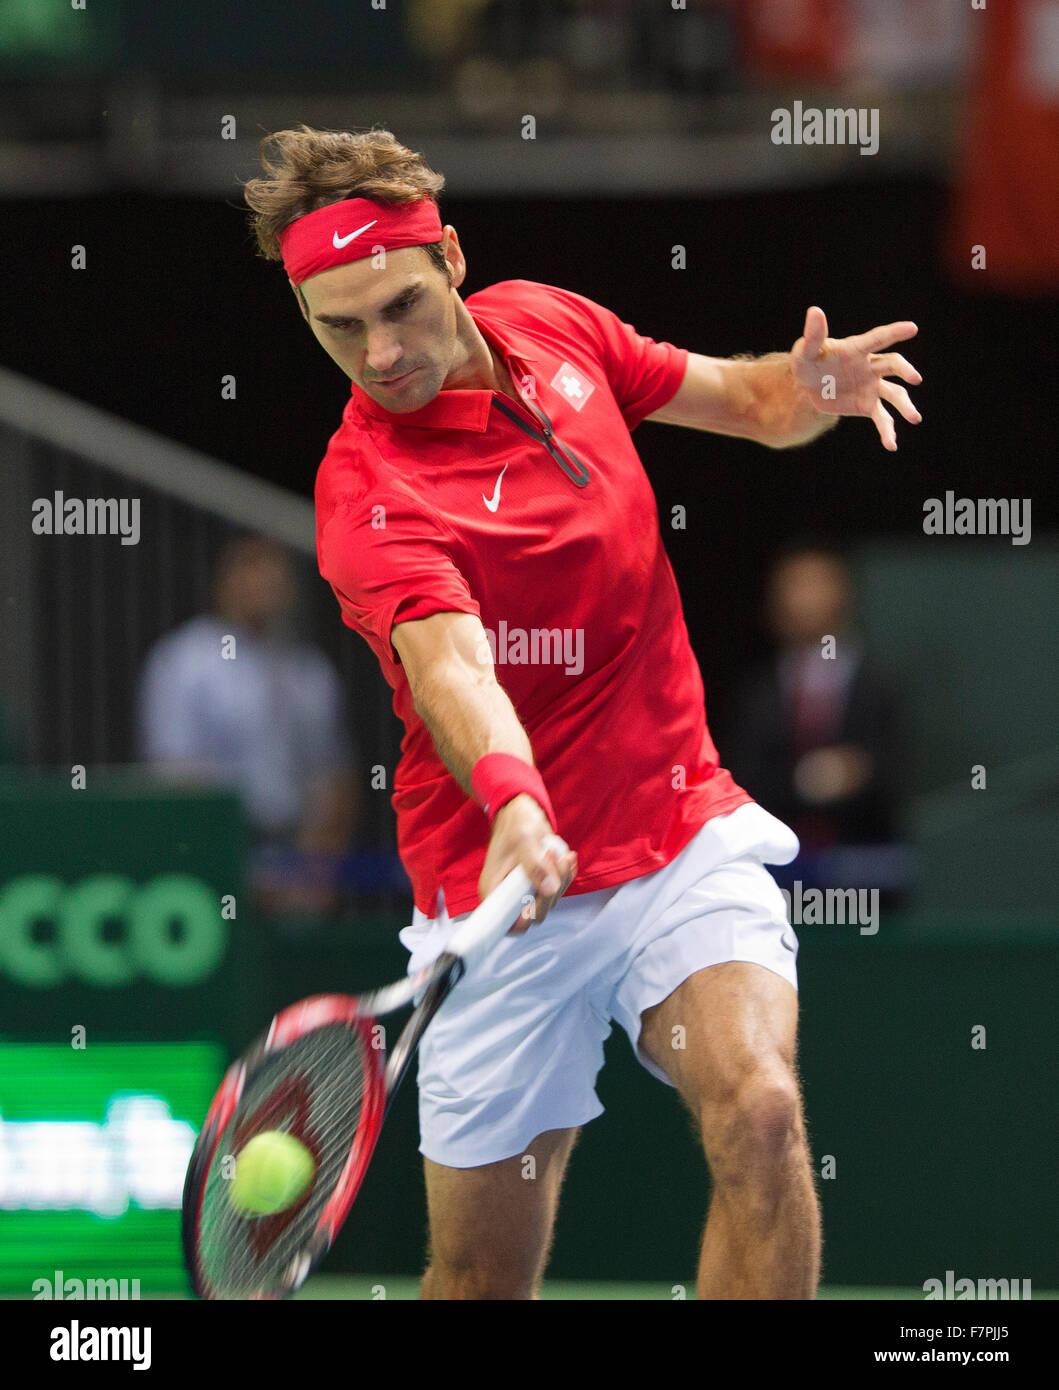 Switserland, Ginebra, 18 de septiembre de 2015, tenis, Copa Davis, Switserland-Netherlands, Roger Federer (SUI) Imagen De Stock